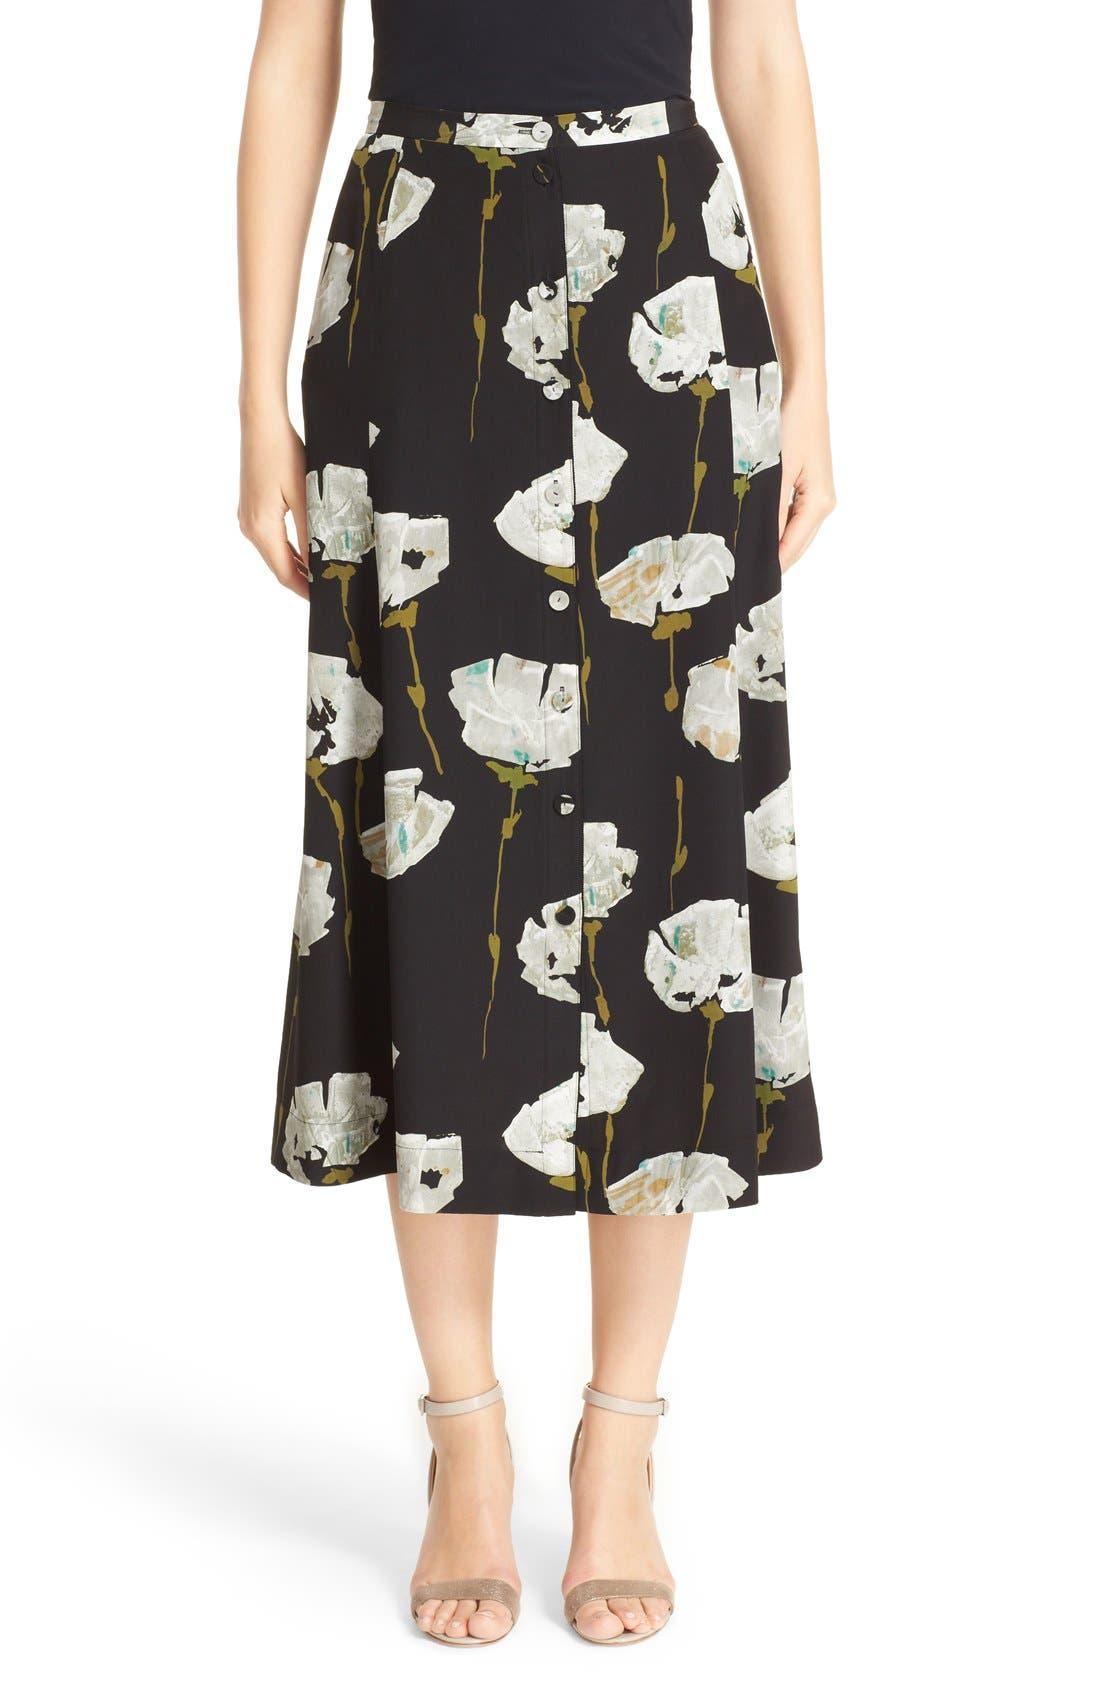 Alternate Image 1 Selected - Lafayette 148 New York Carissa Floral Print Skirt